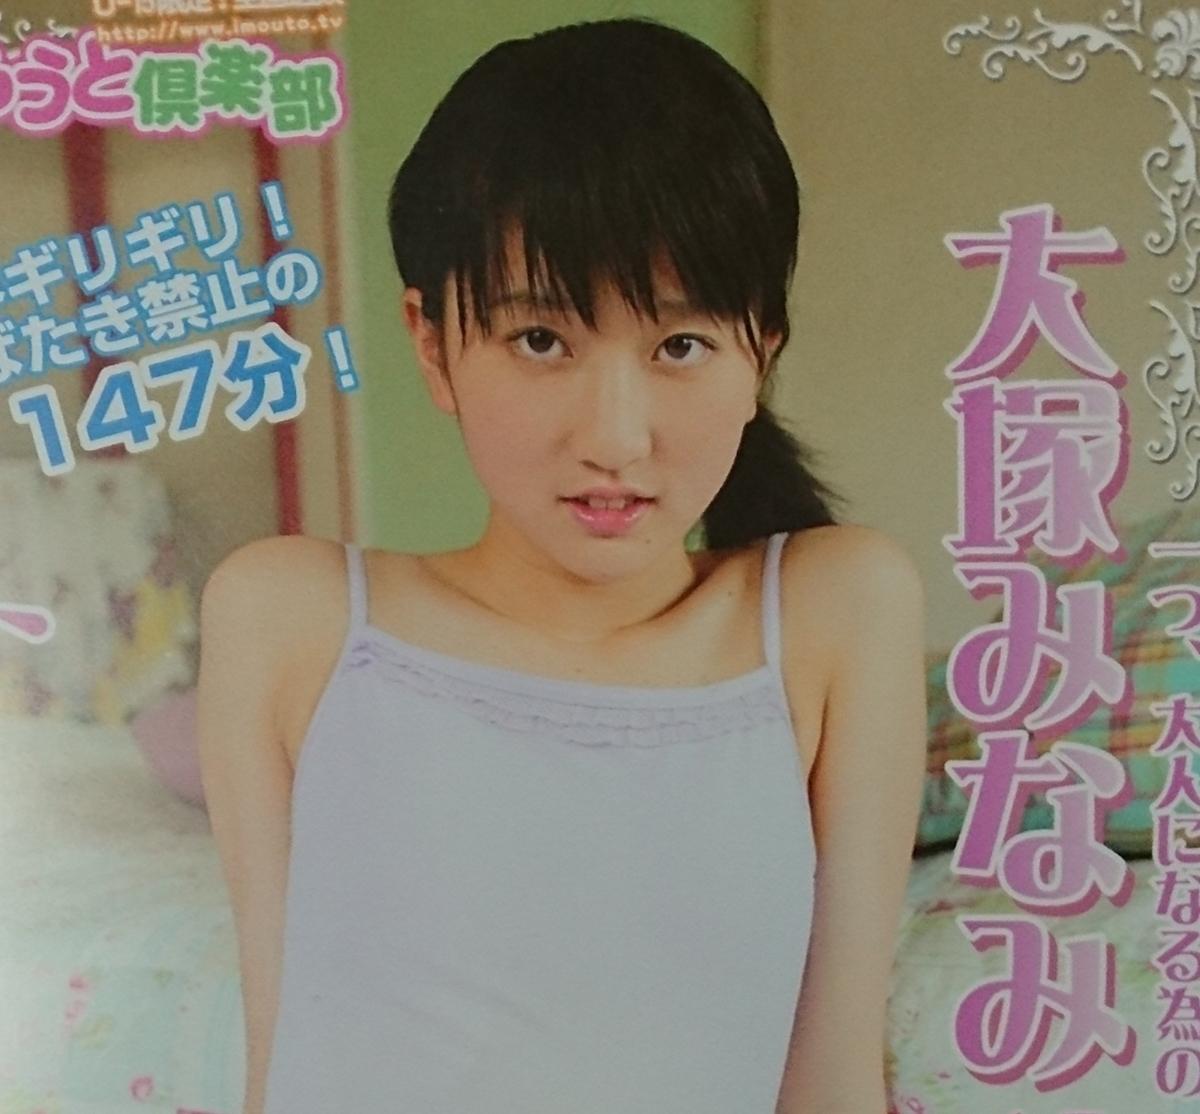 Minisuka Tv大塚みなみ投稿画像401枚&minisuka.tvなぎさ